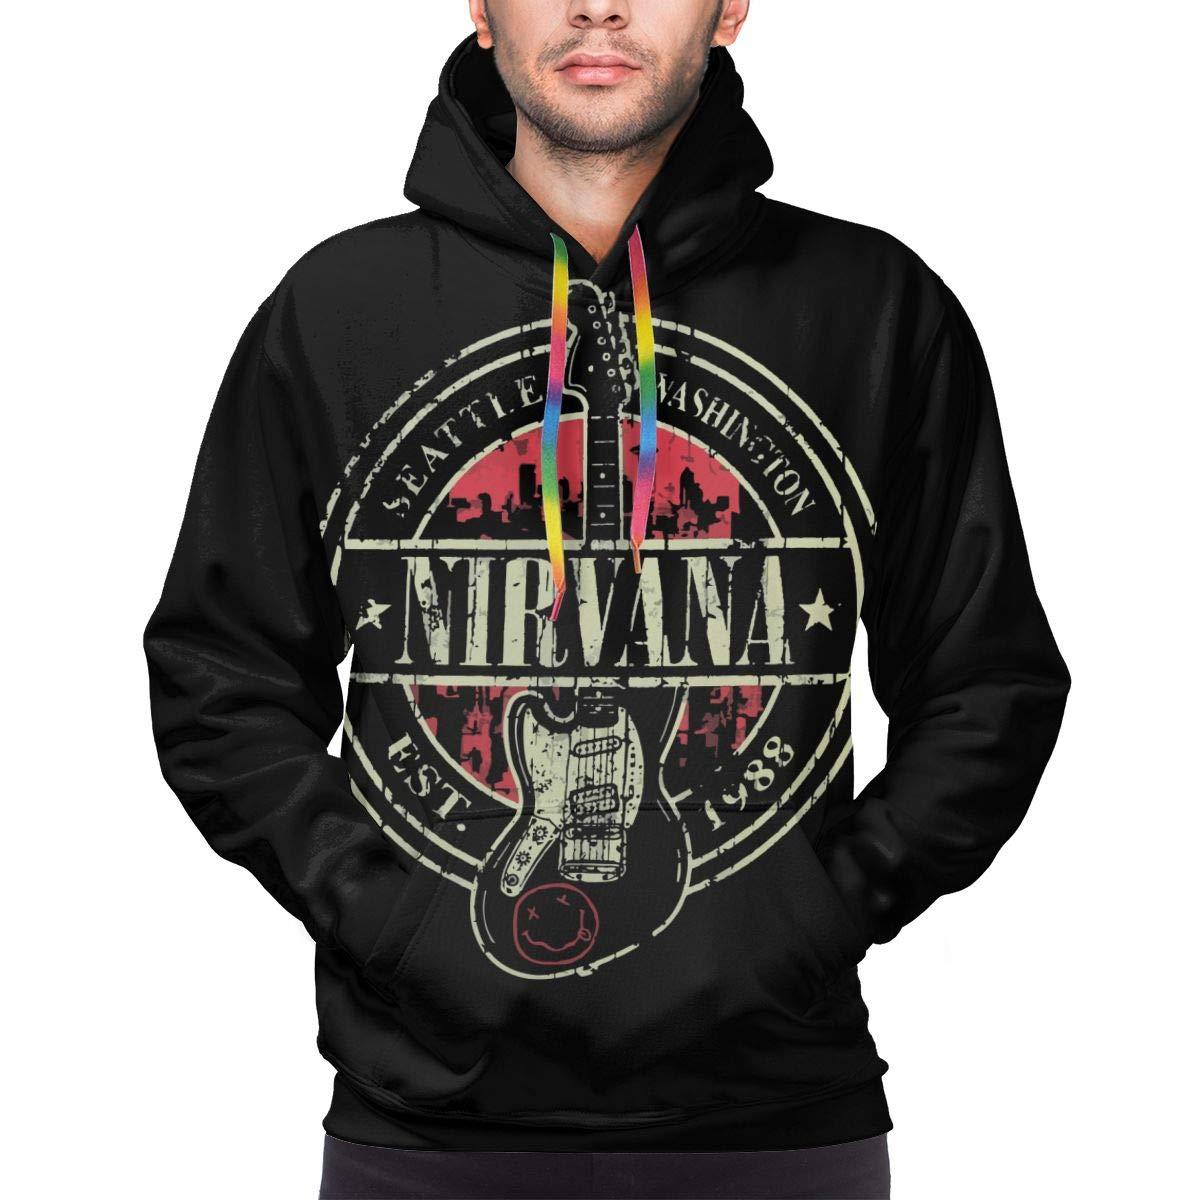 Fashion Drug Hoodies Men/'s Nirvana Long Sleeve Athletic Sweatshirt Pullover with Pocket